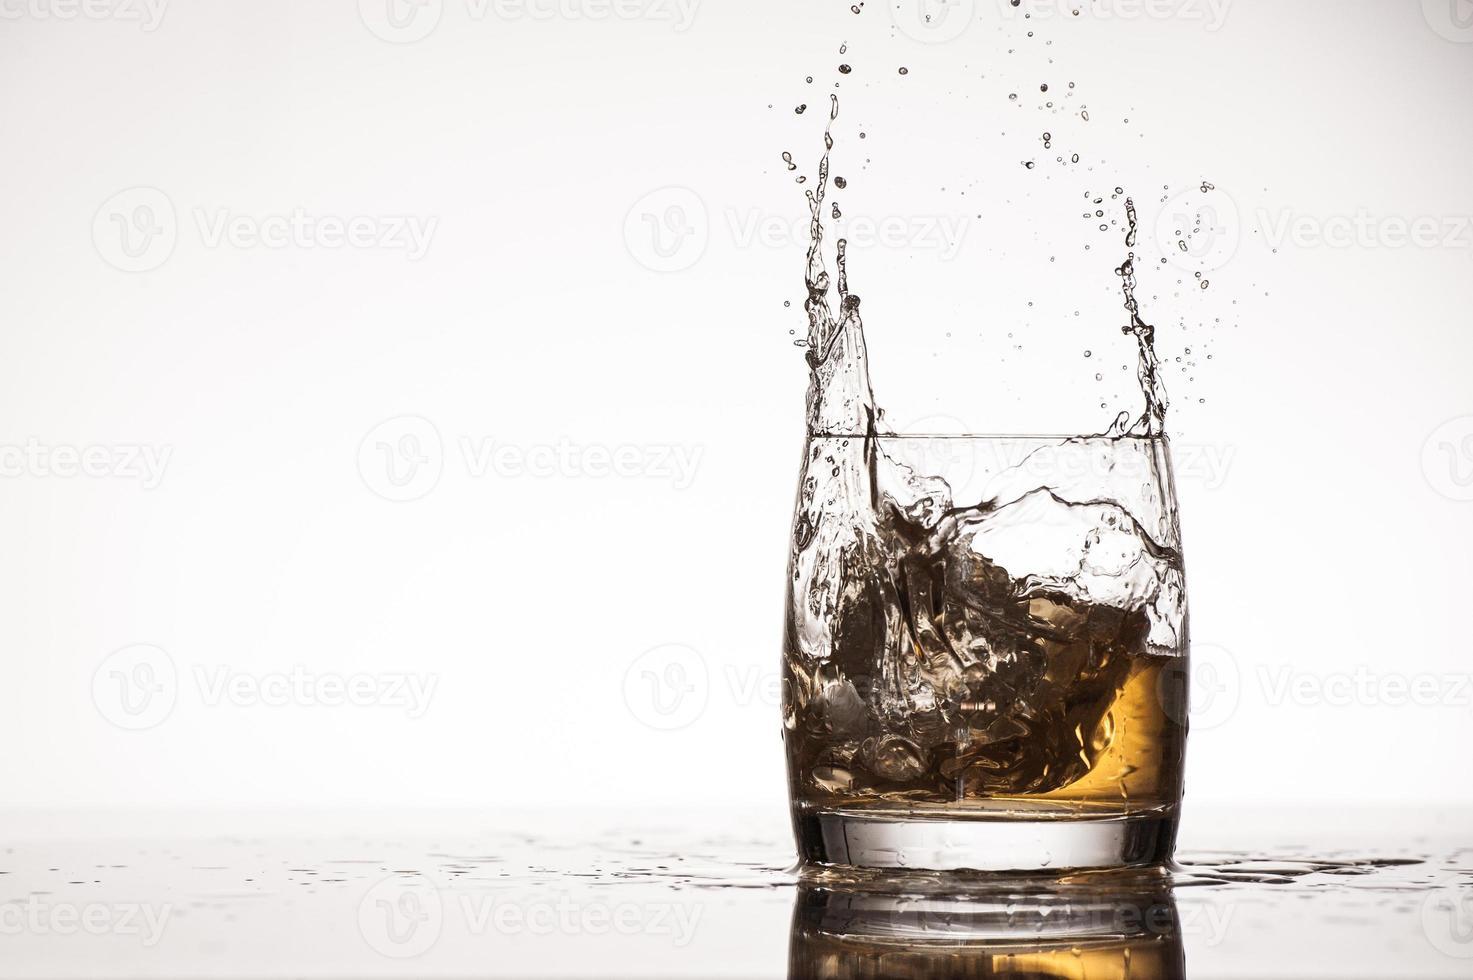 salpicaduras de hielo en whisky o brandy foto